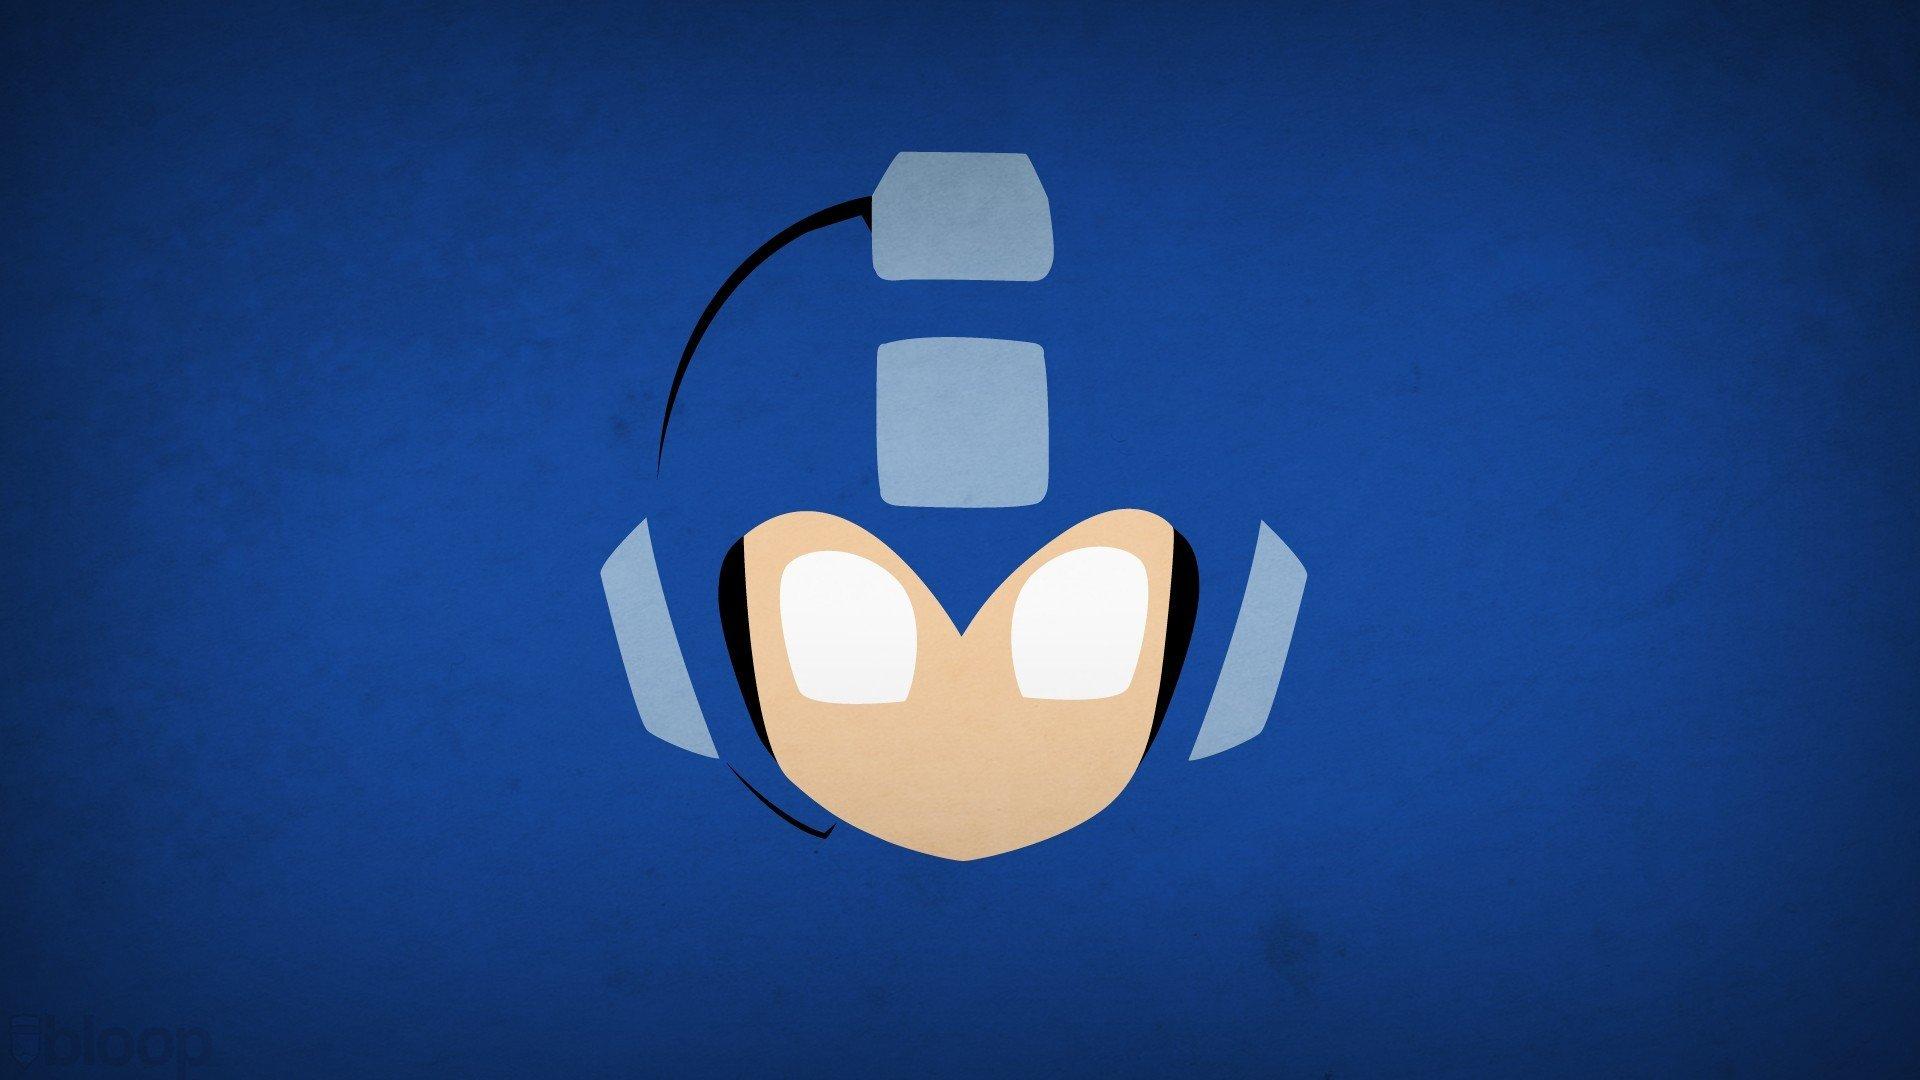 Mega Man Blo0p Minimalism Hd Wallpapers Desktop And Mobile Images Photos